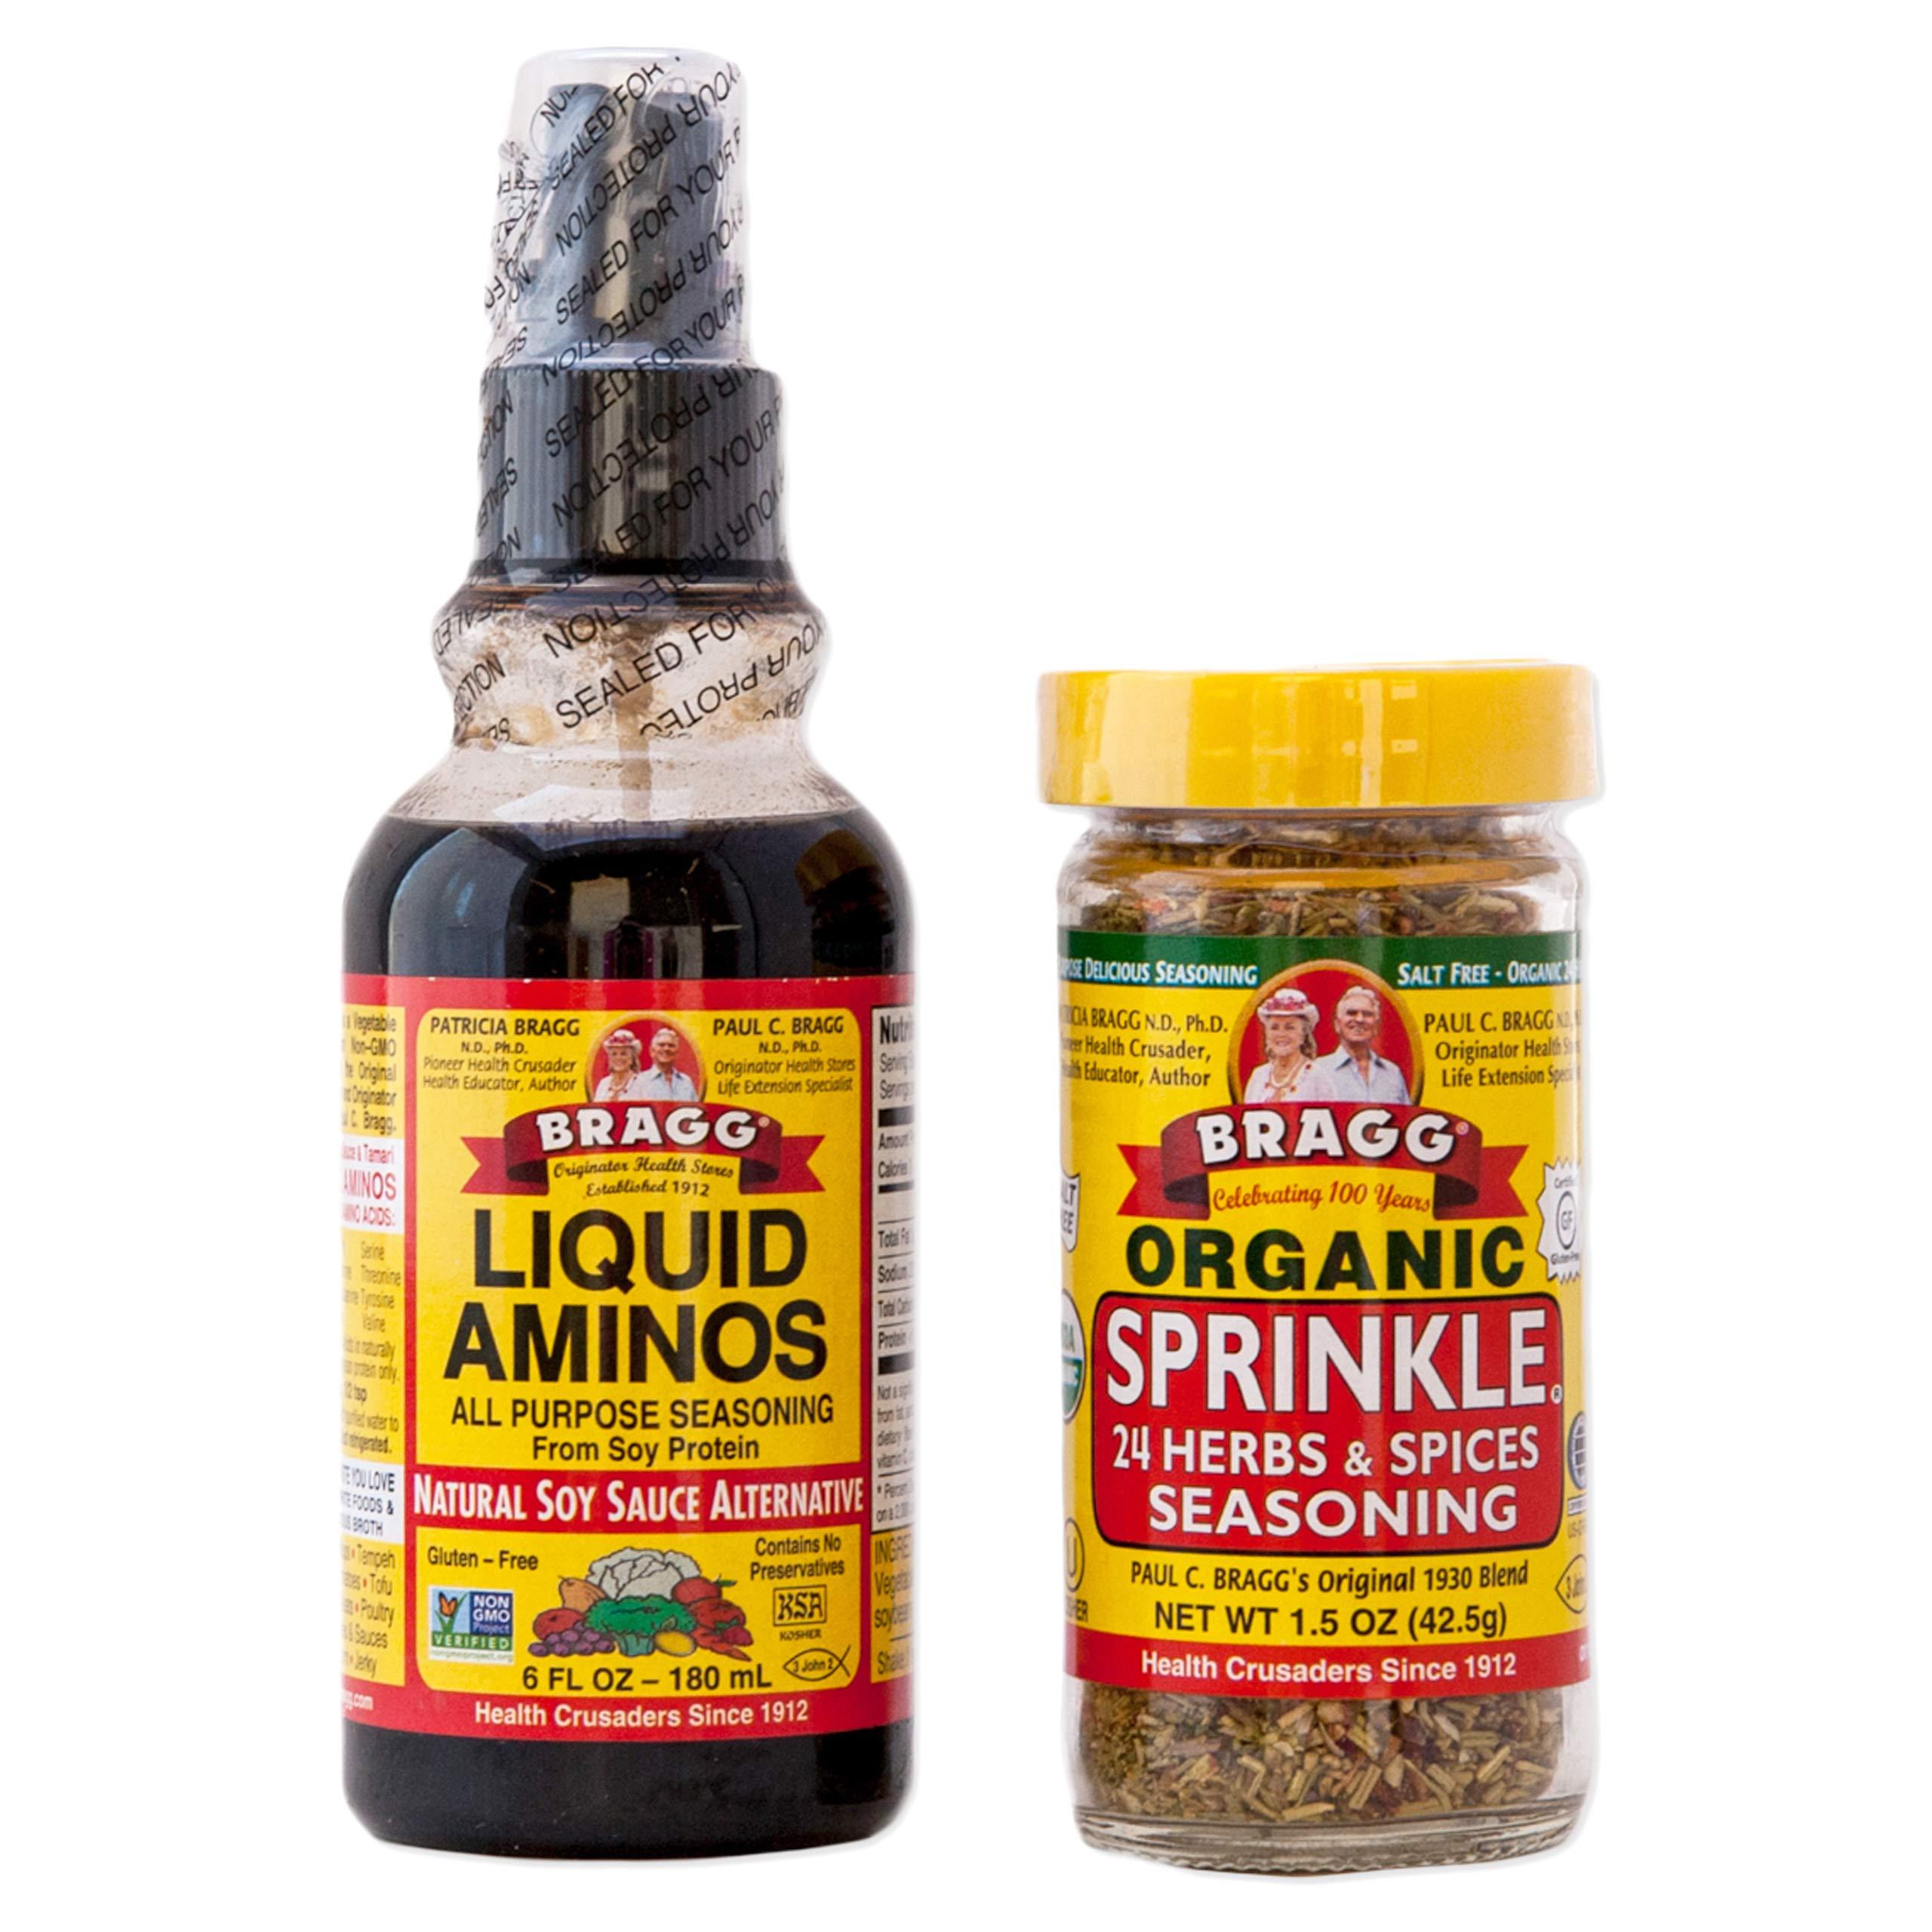 Braggs Organic Sprinkle Seasoning Braggs Liquid Aminos Bundle Bragg Sprinkle Herb And Spice Seasoning 1.5 oz Bragg Liquid Aminos Spray 6 Oz Bragg Seasoning For Cooking